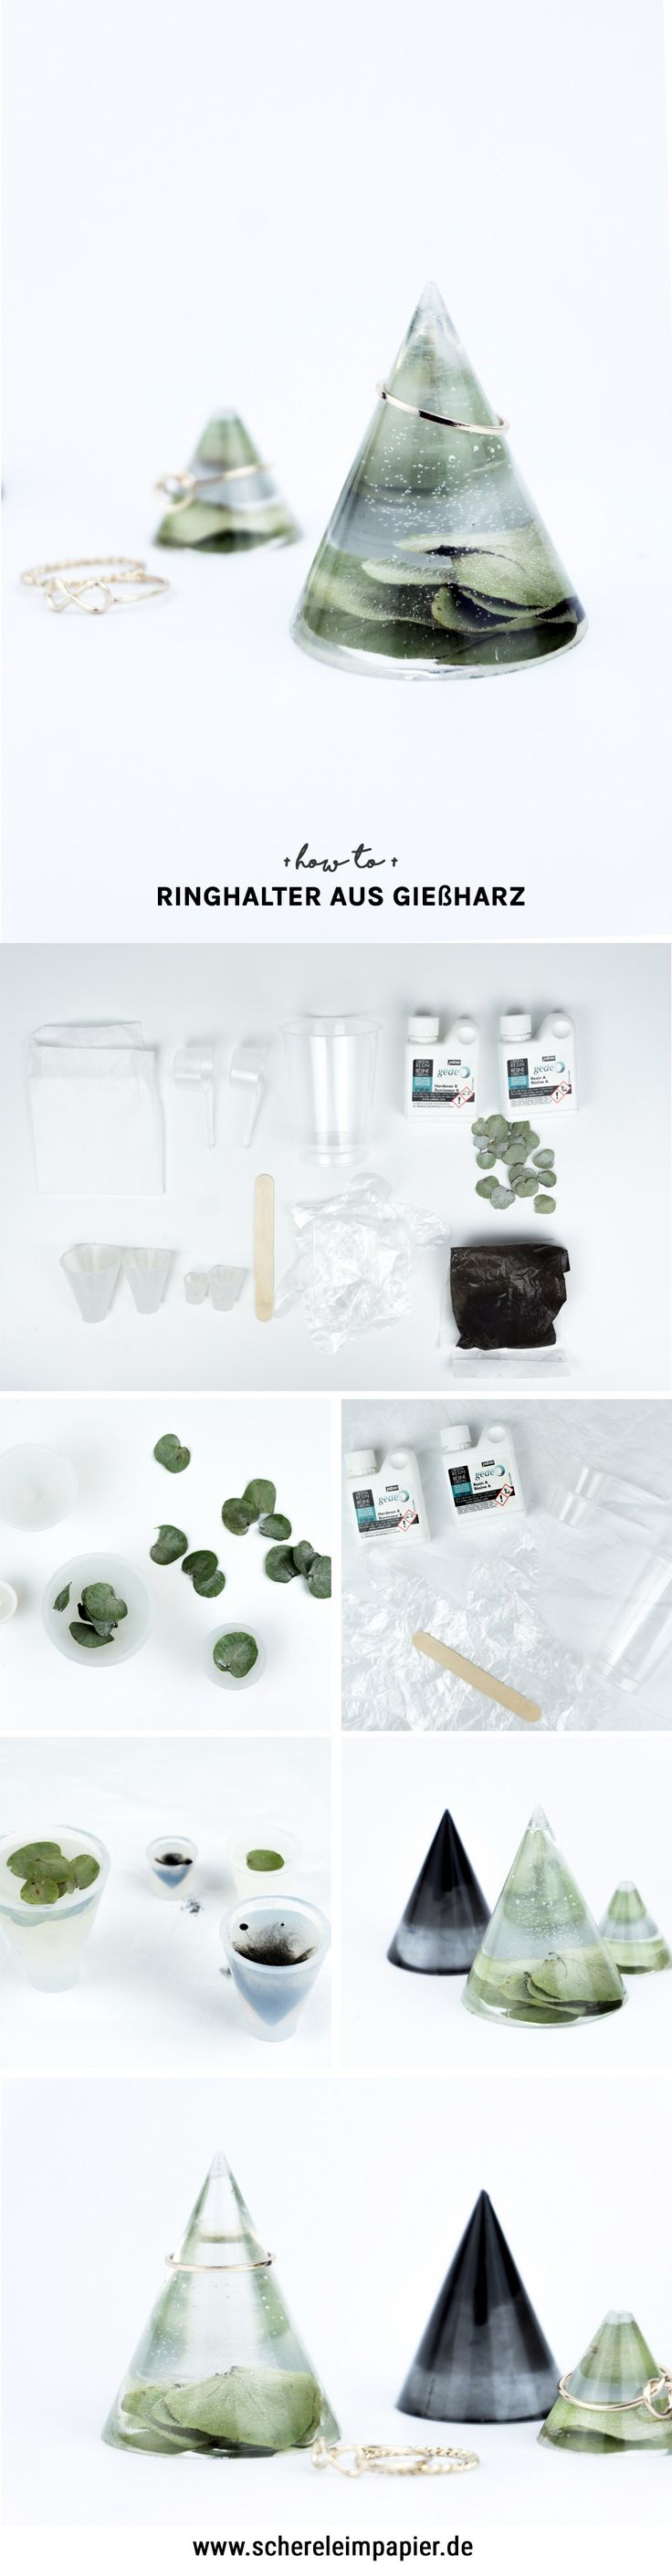 Gift idea: DIY ring holder made of resin itself